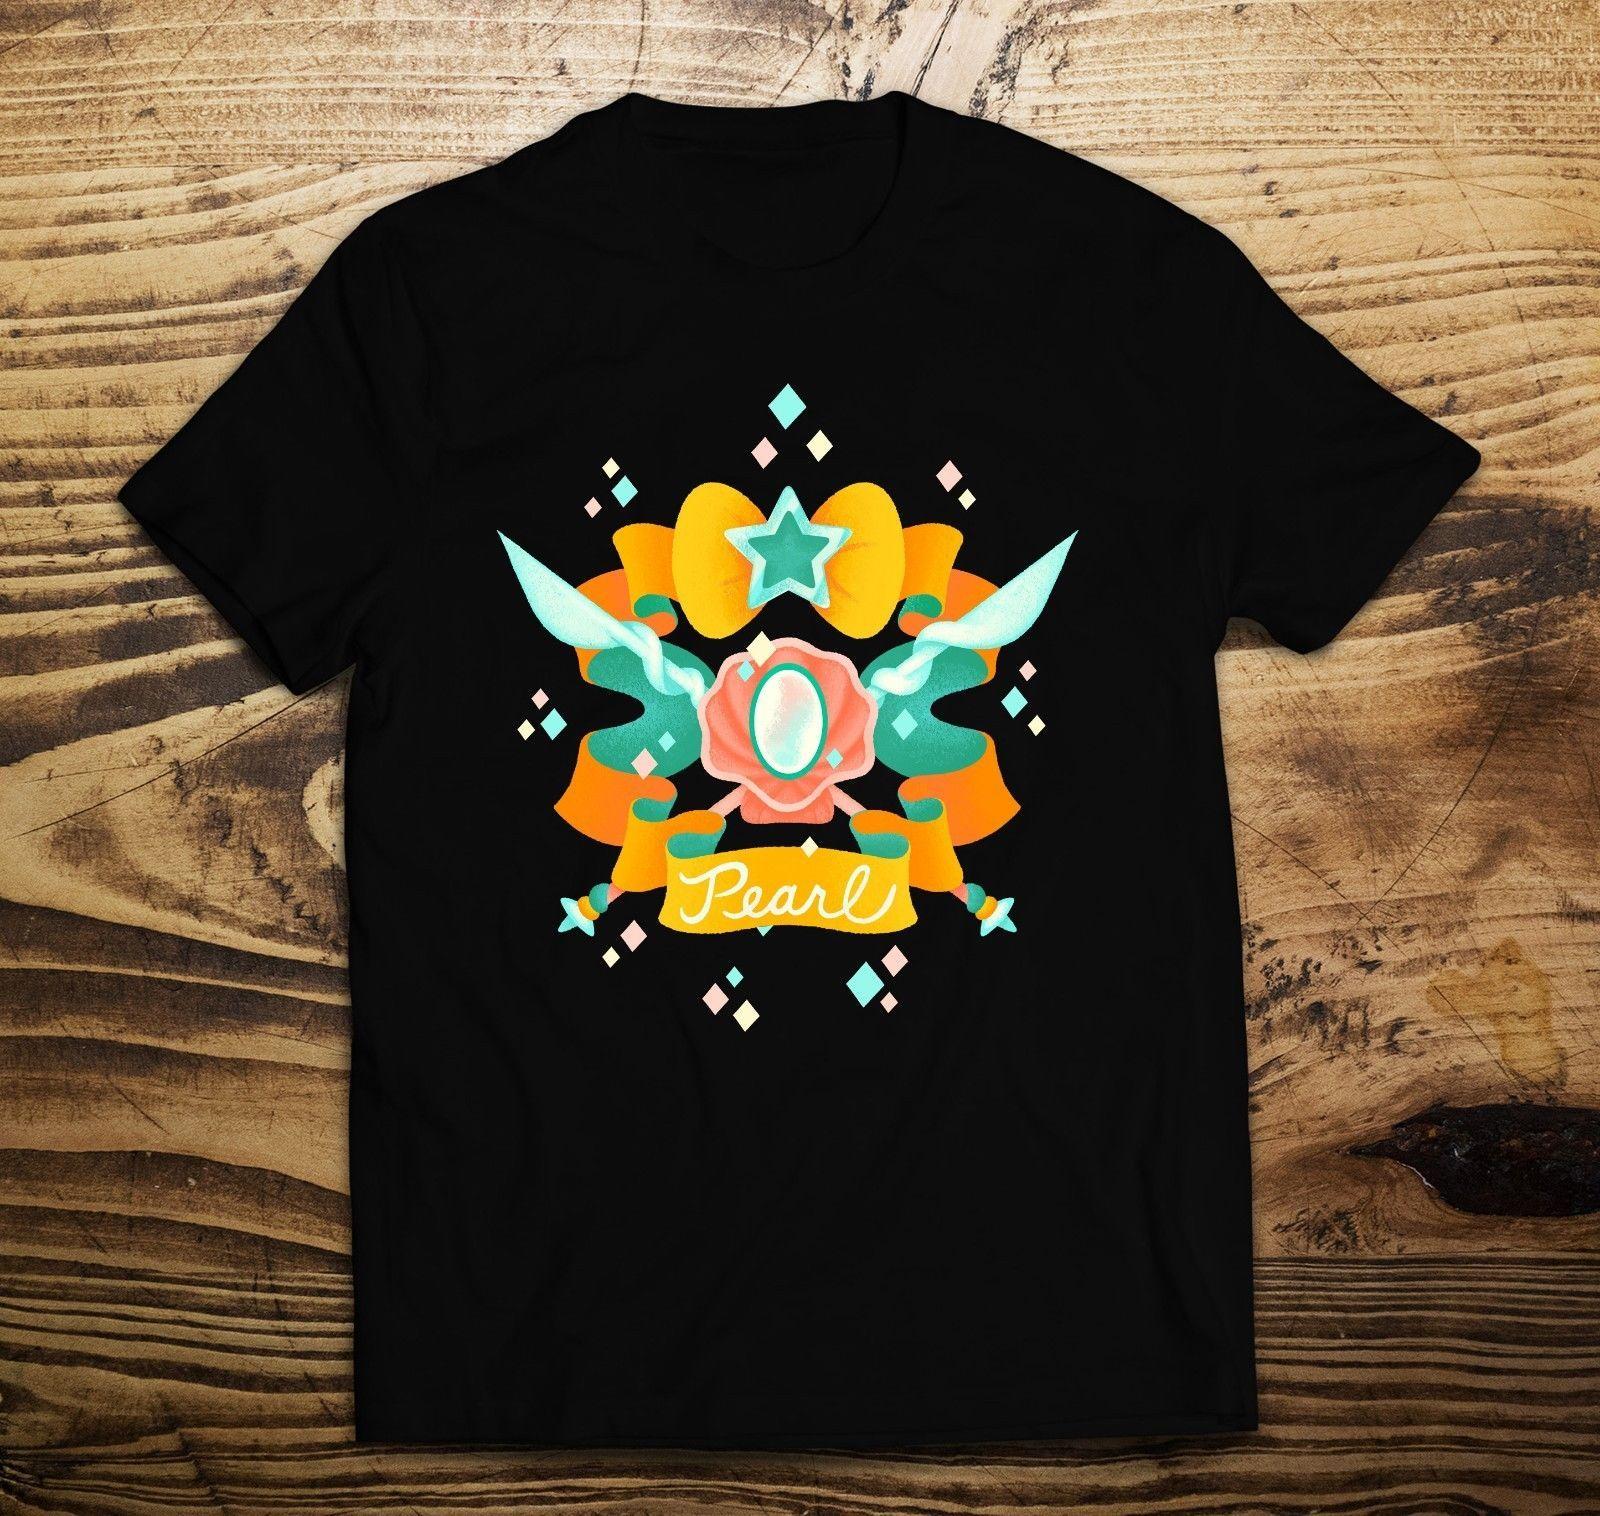 Compre Steven Universe Shirt Pearl Steven Universe Camiseta Discout Hot New  Fashion T Shirt Top Envío Gratis 2019 Officia A  24.2 Del Abmosstore  d085efdd0752c